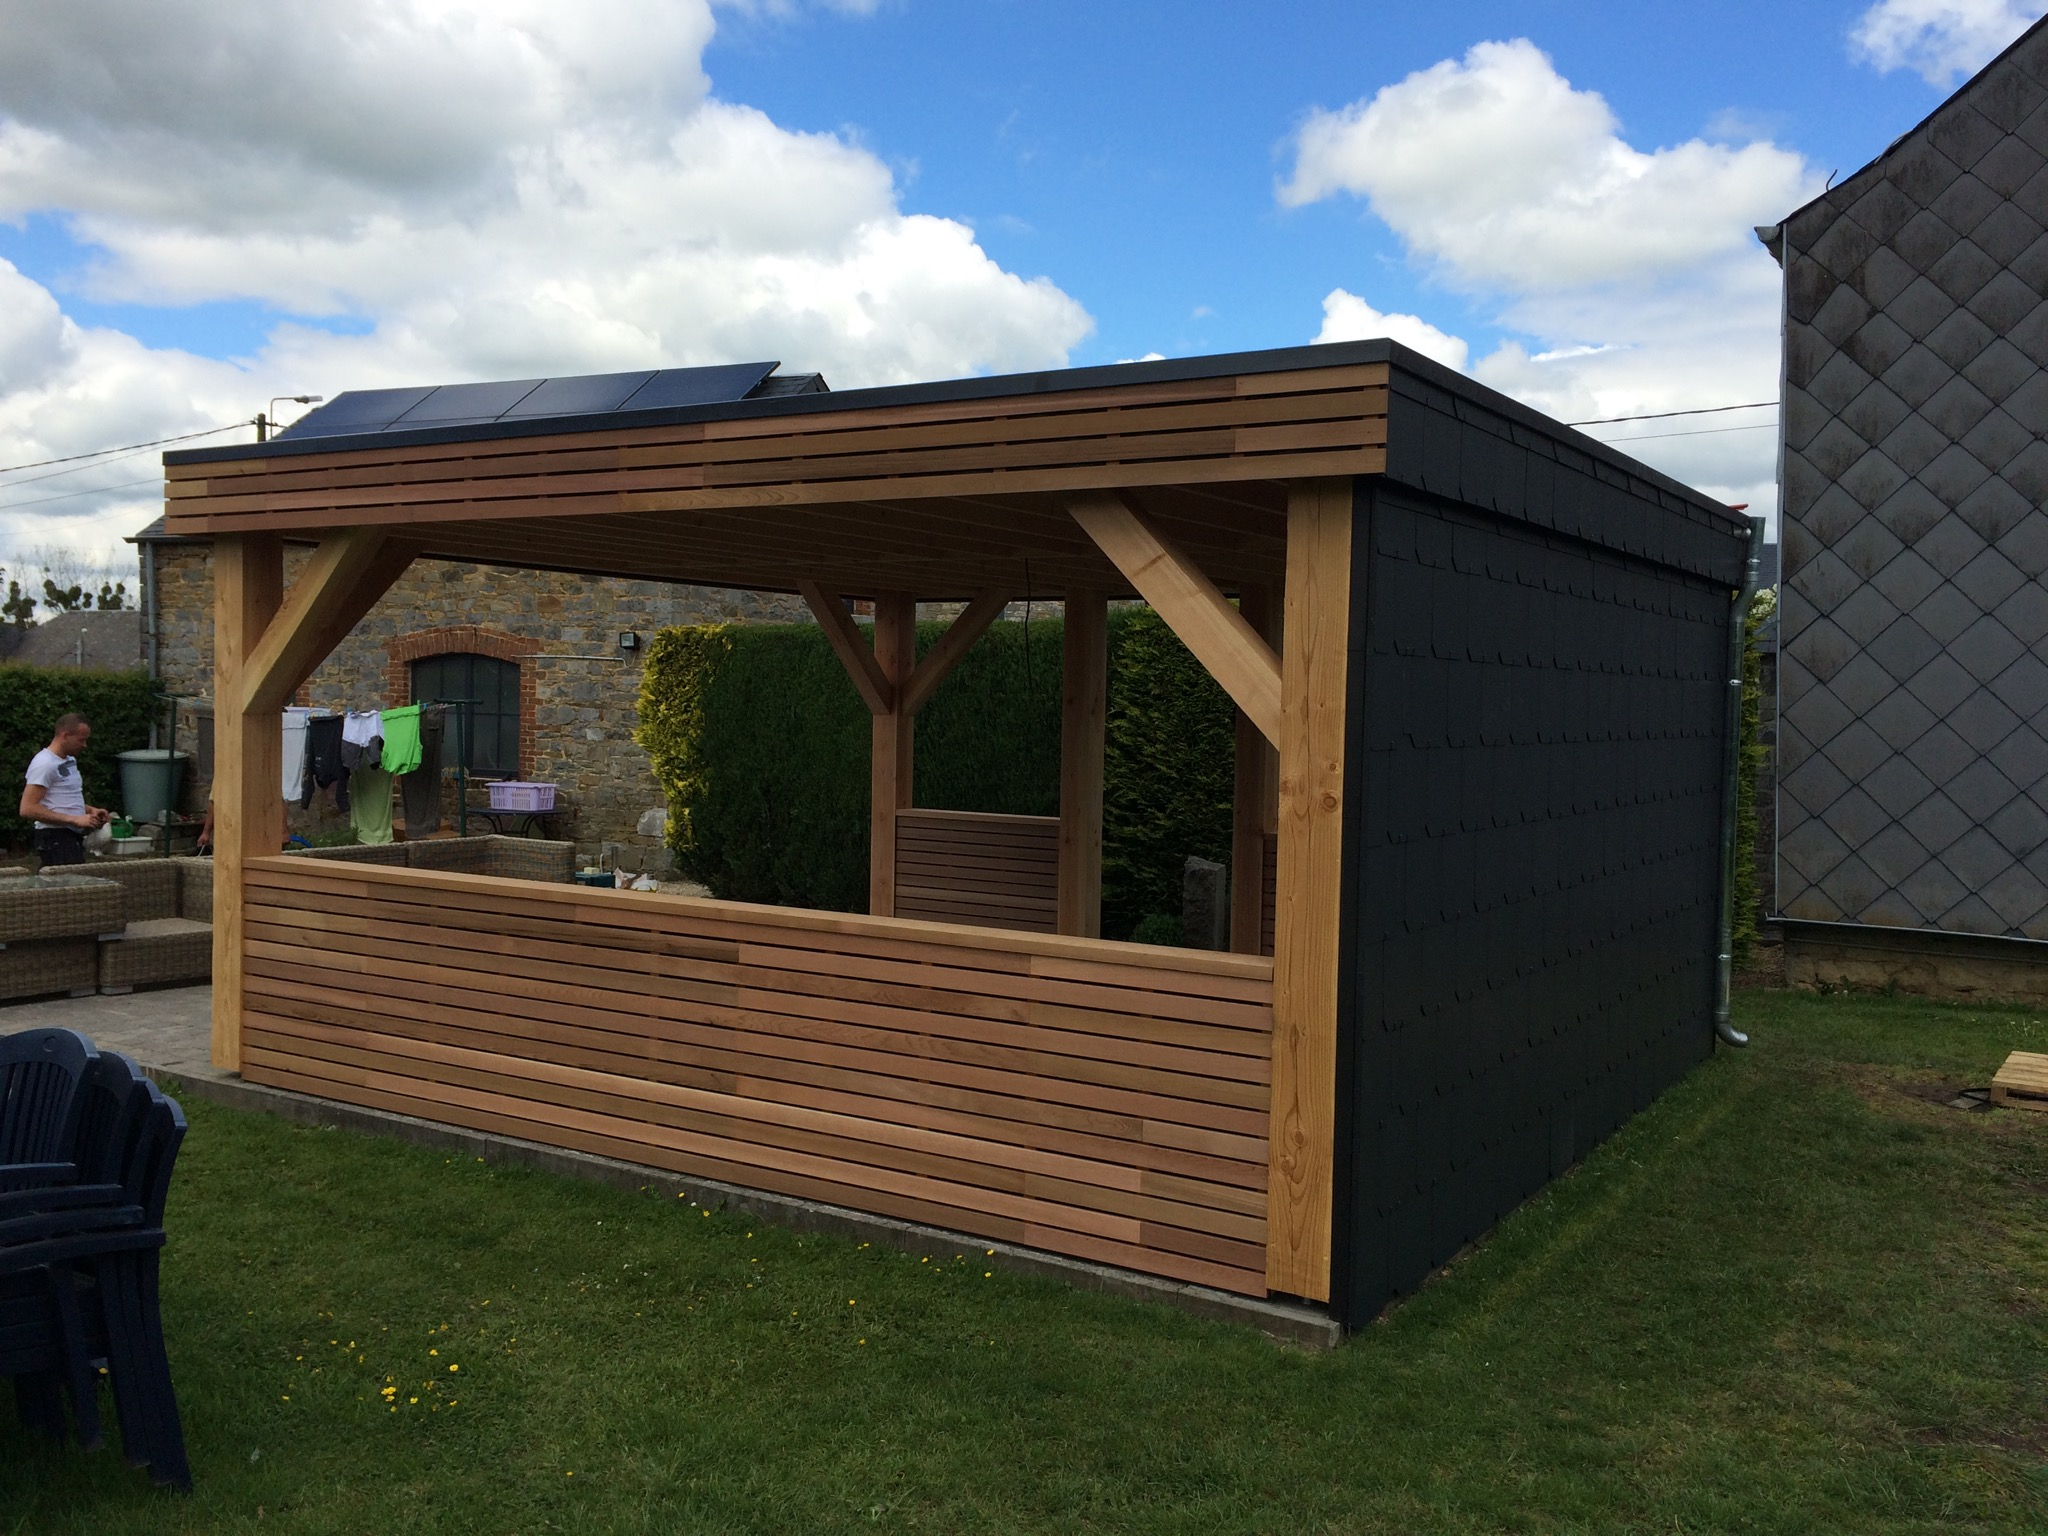 Img 2337 toitures van baelen for Comconstruction d un abri de jardin